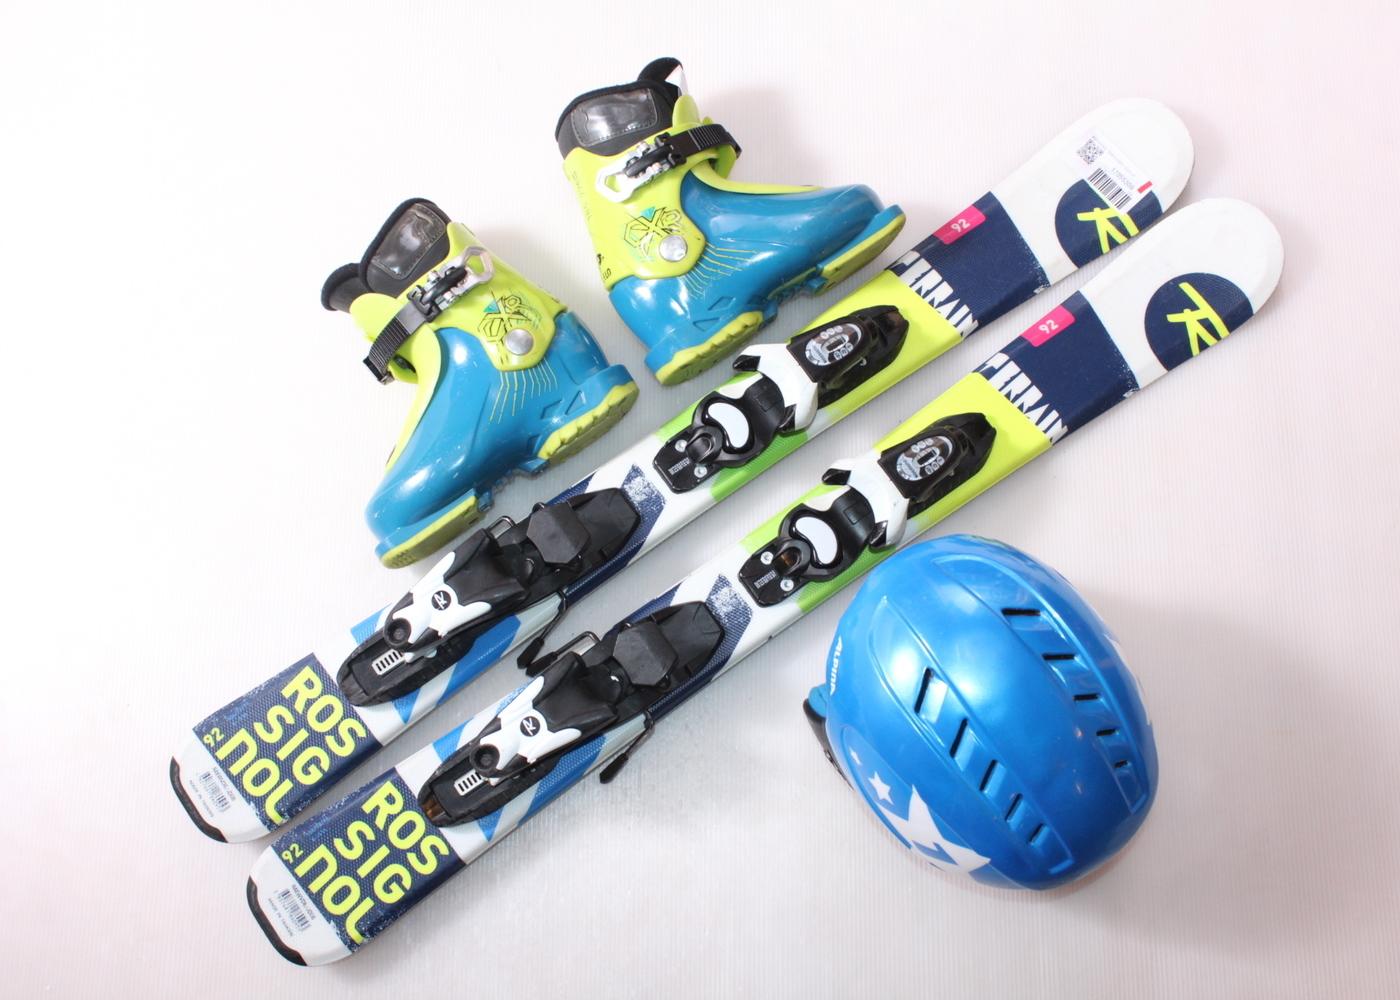 Dětské lyže ROSSIGNOL TERRAIN BOY 92 cm + lyžáky  29EU + helma